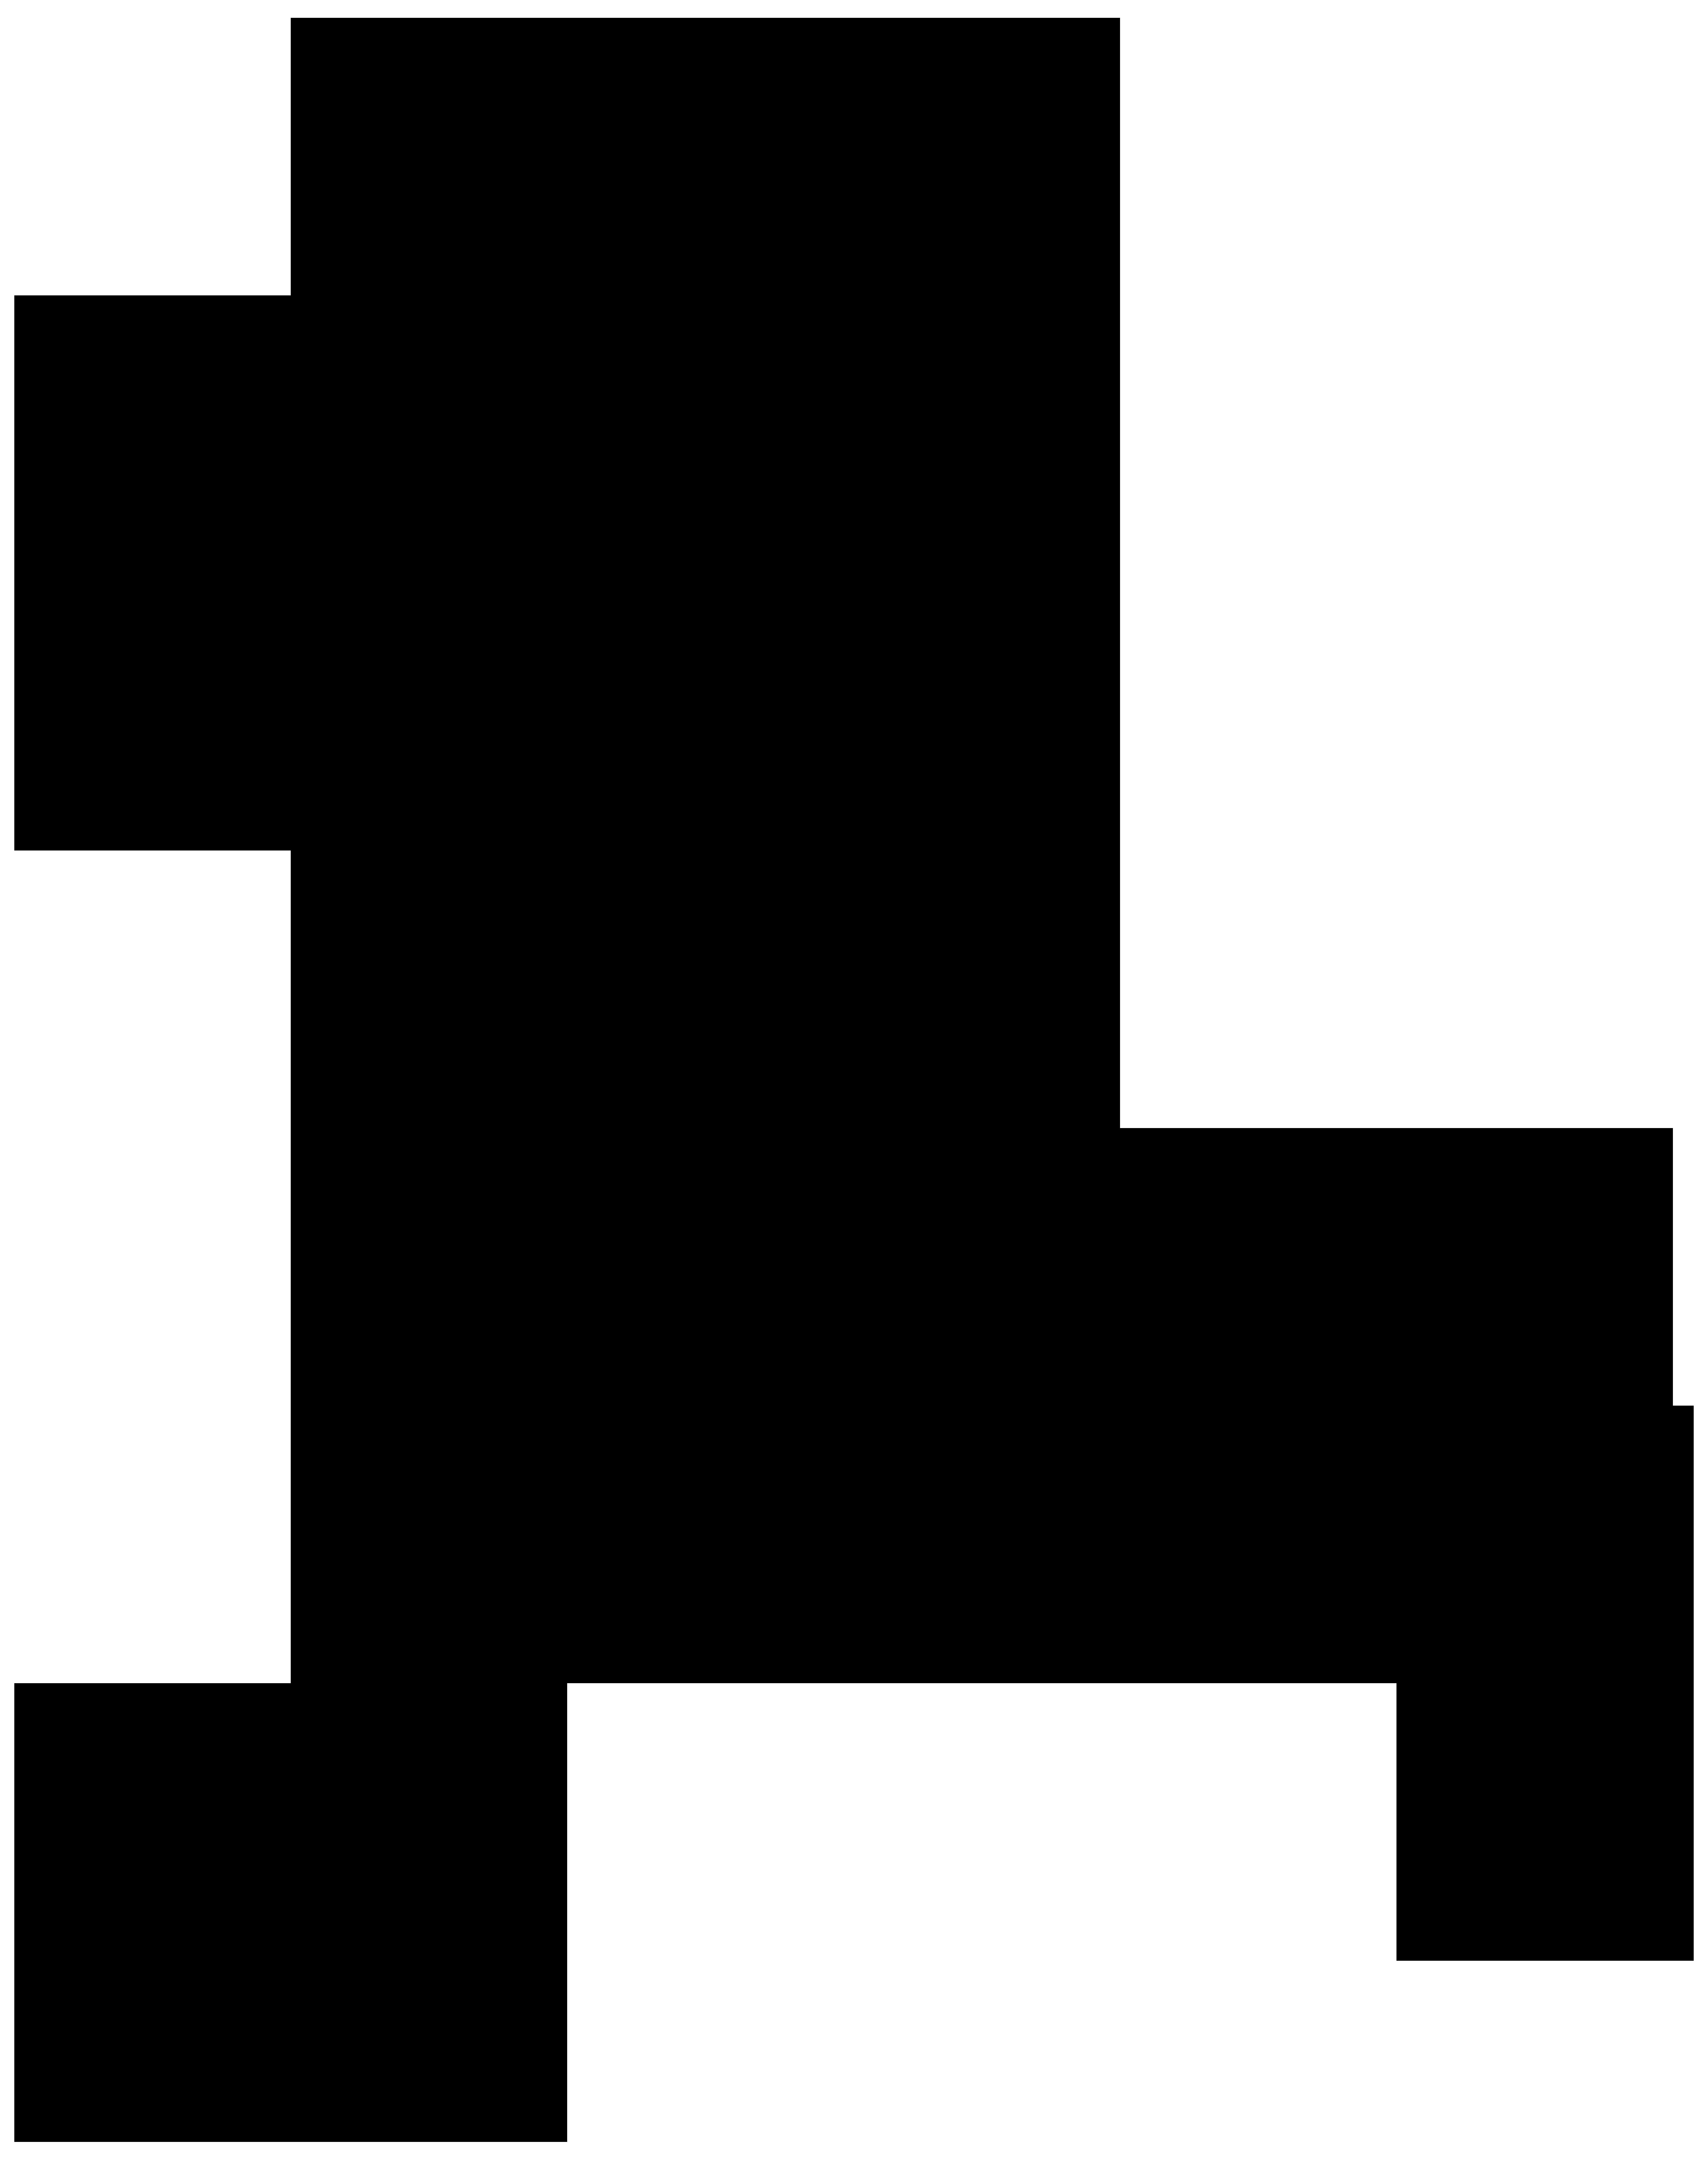 Roadrunner basketball clipart clip black and white Runner Girl Silhouette at GetDrawings.com | Free for personal use ... clip black and white